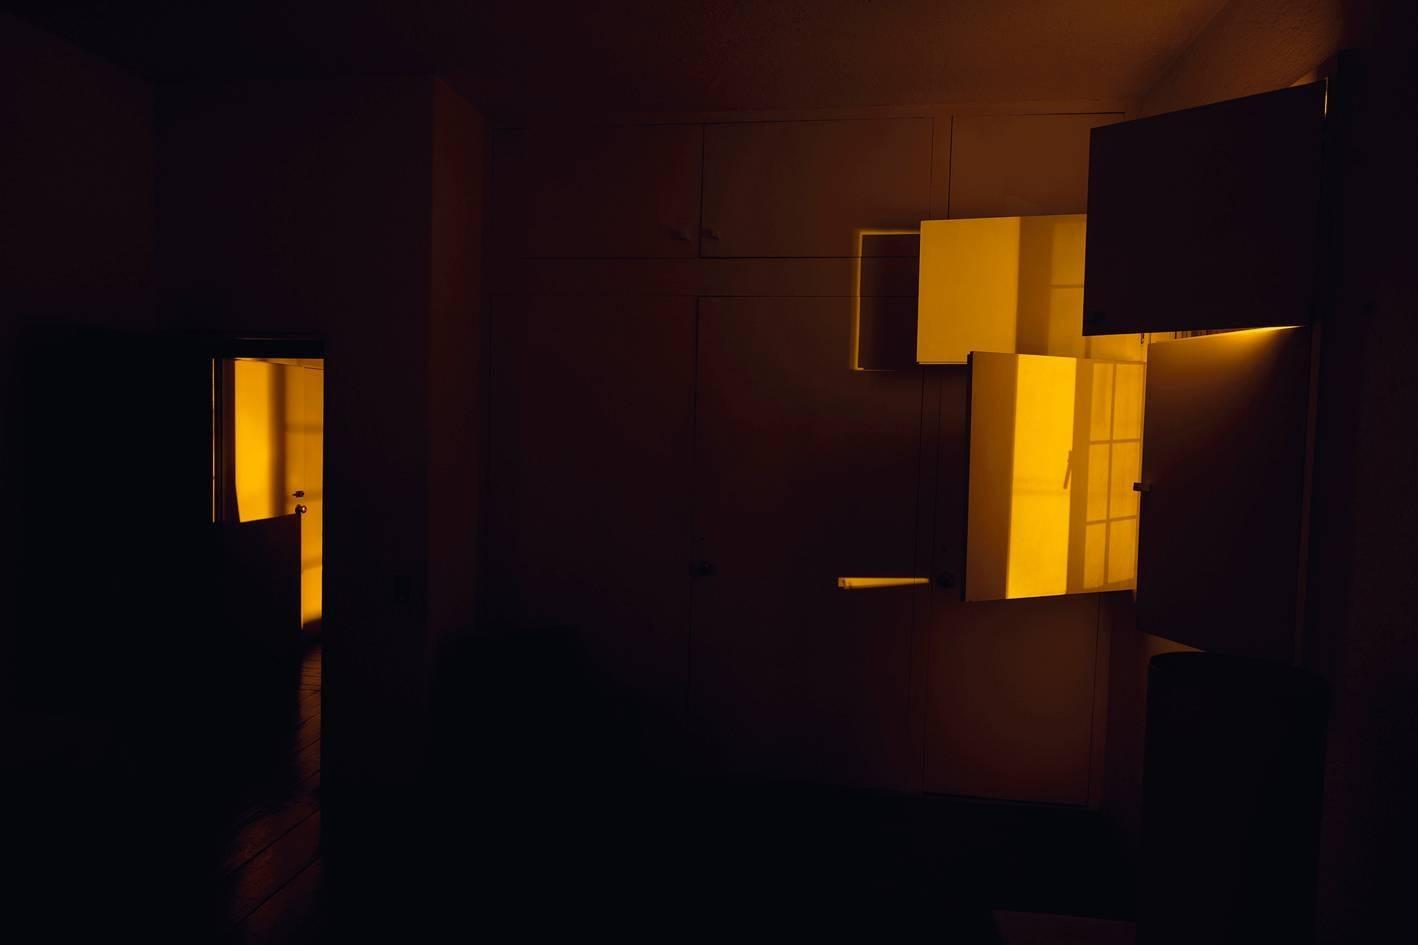 Dark Rooms. Barragán in the shade 6